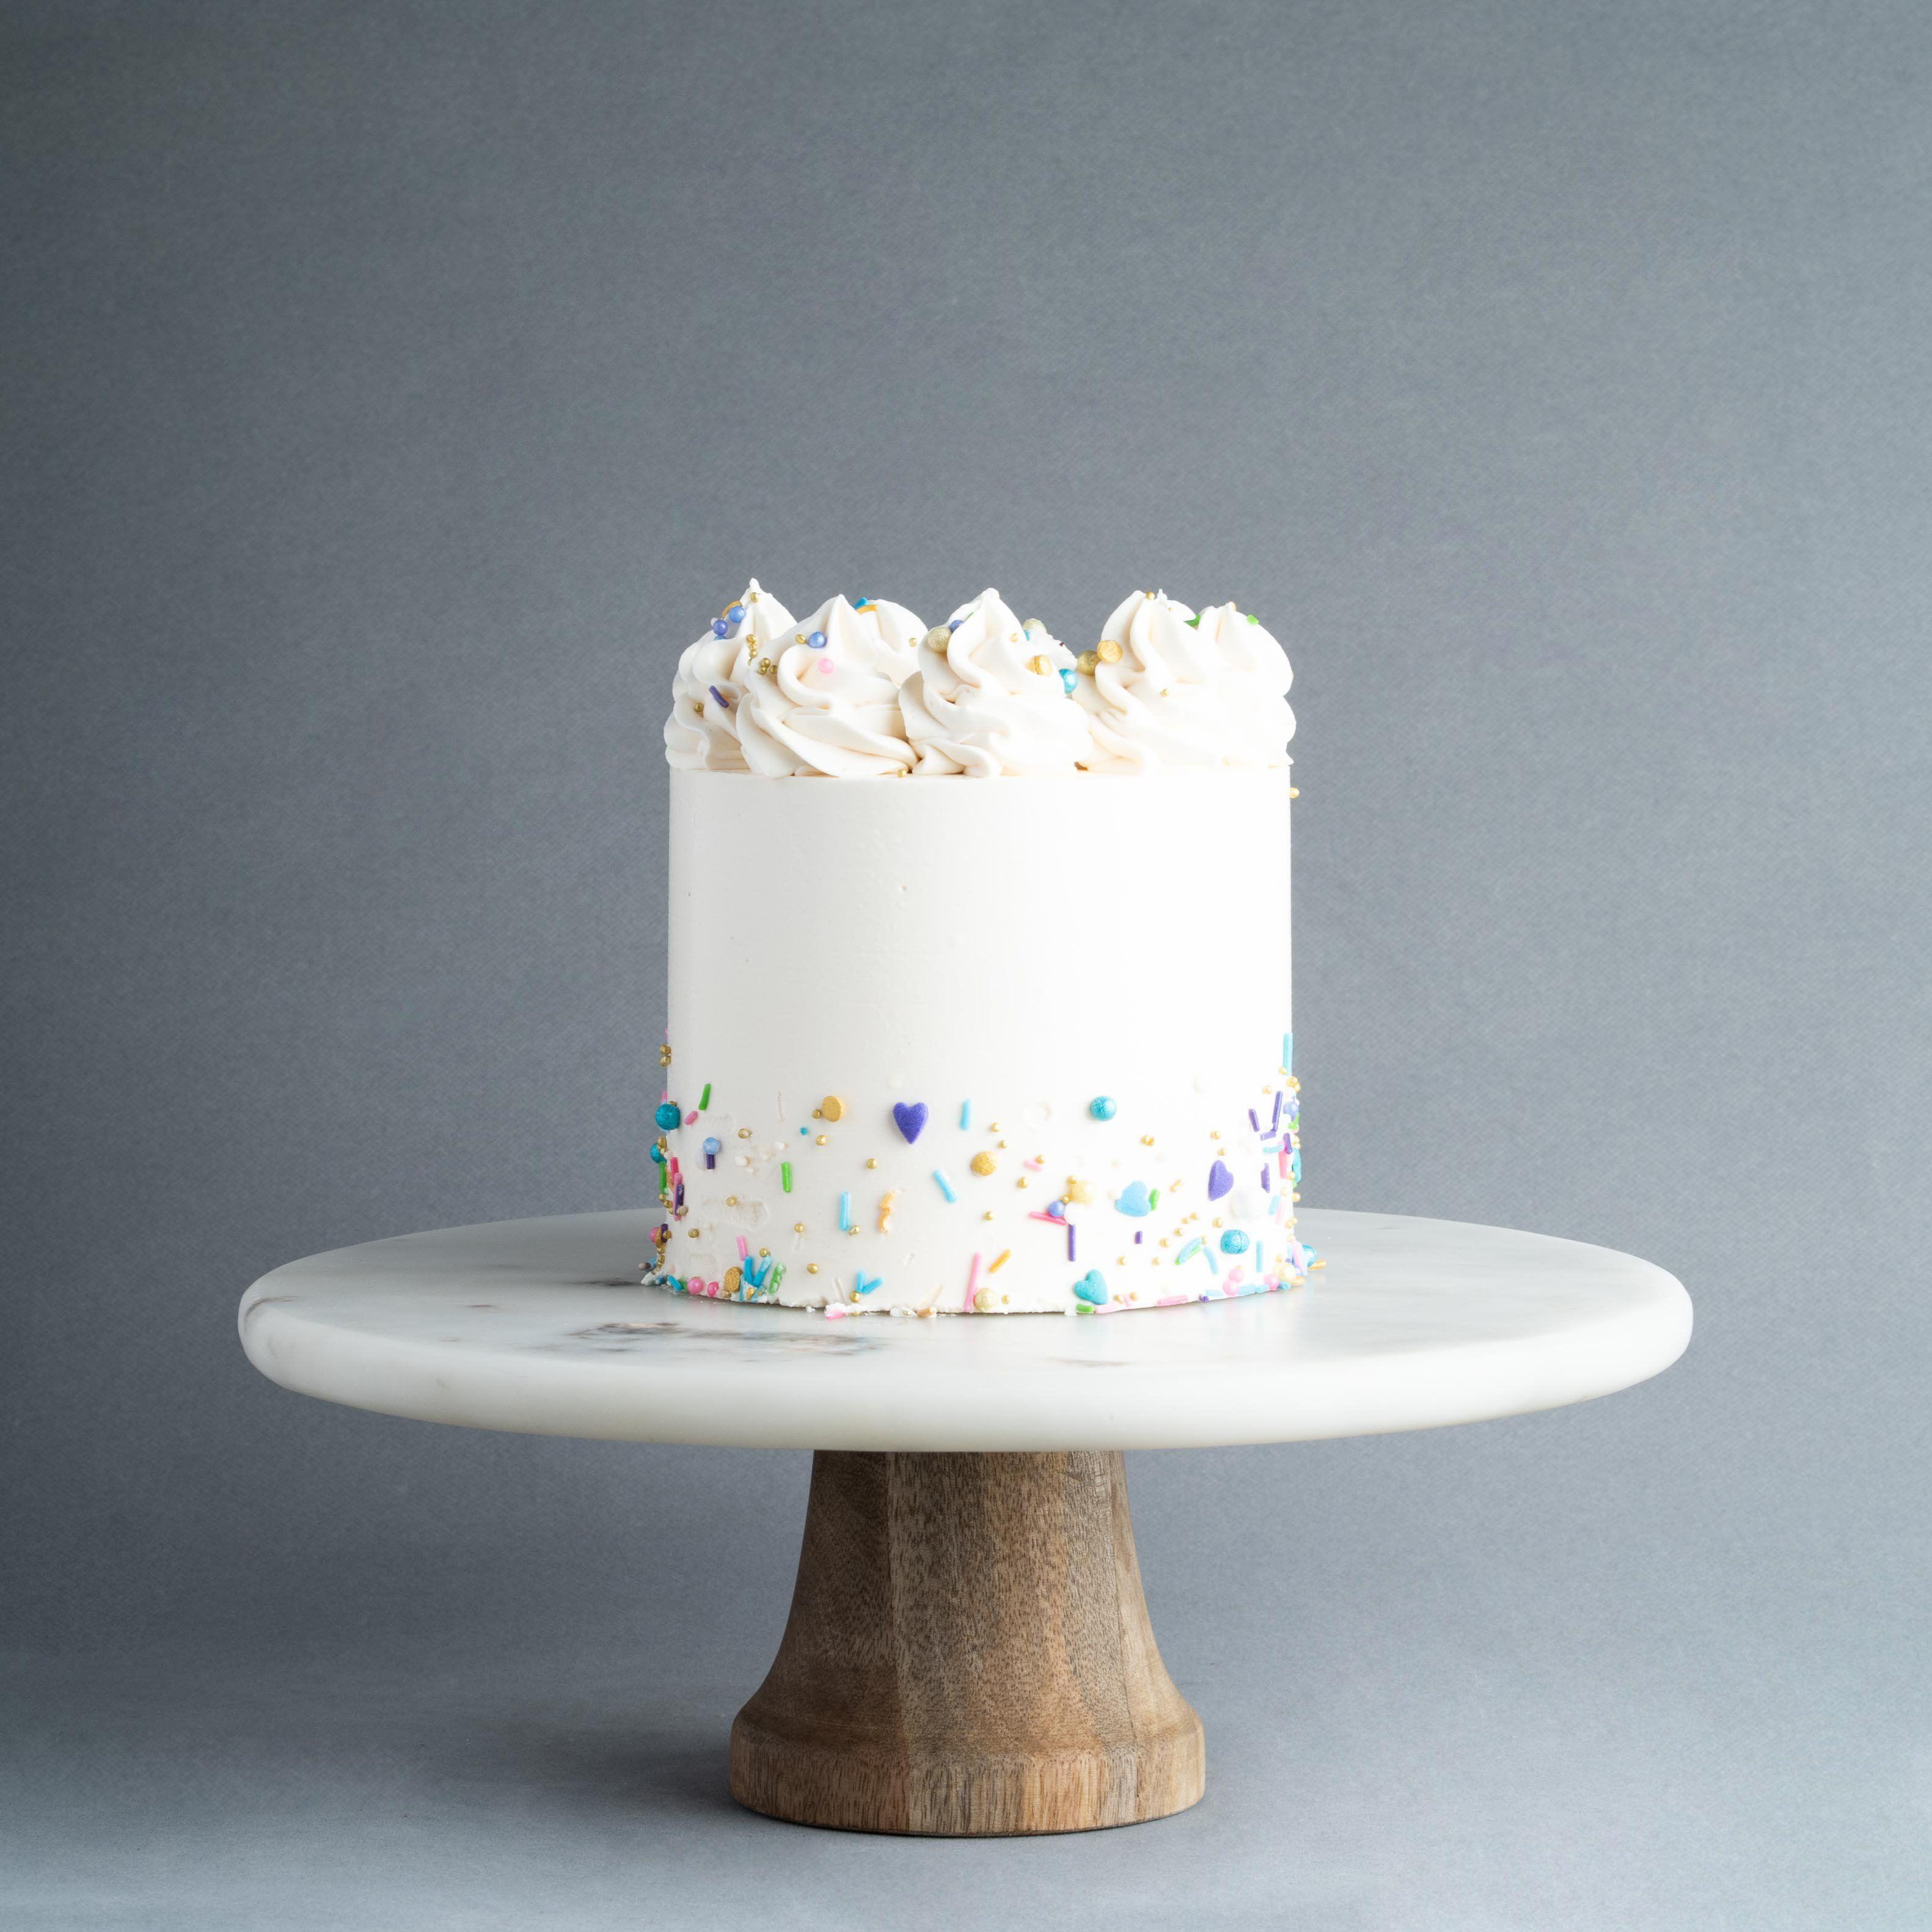 For heavens cake 5 in 2020 cake decadent cakes cake